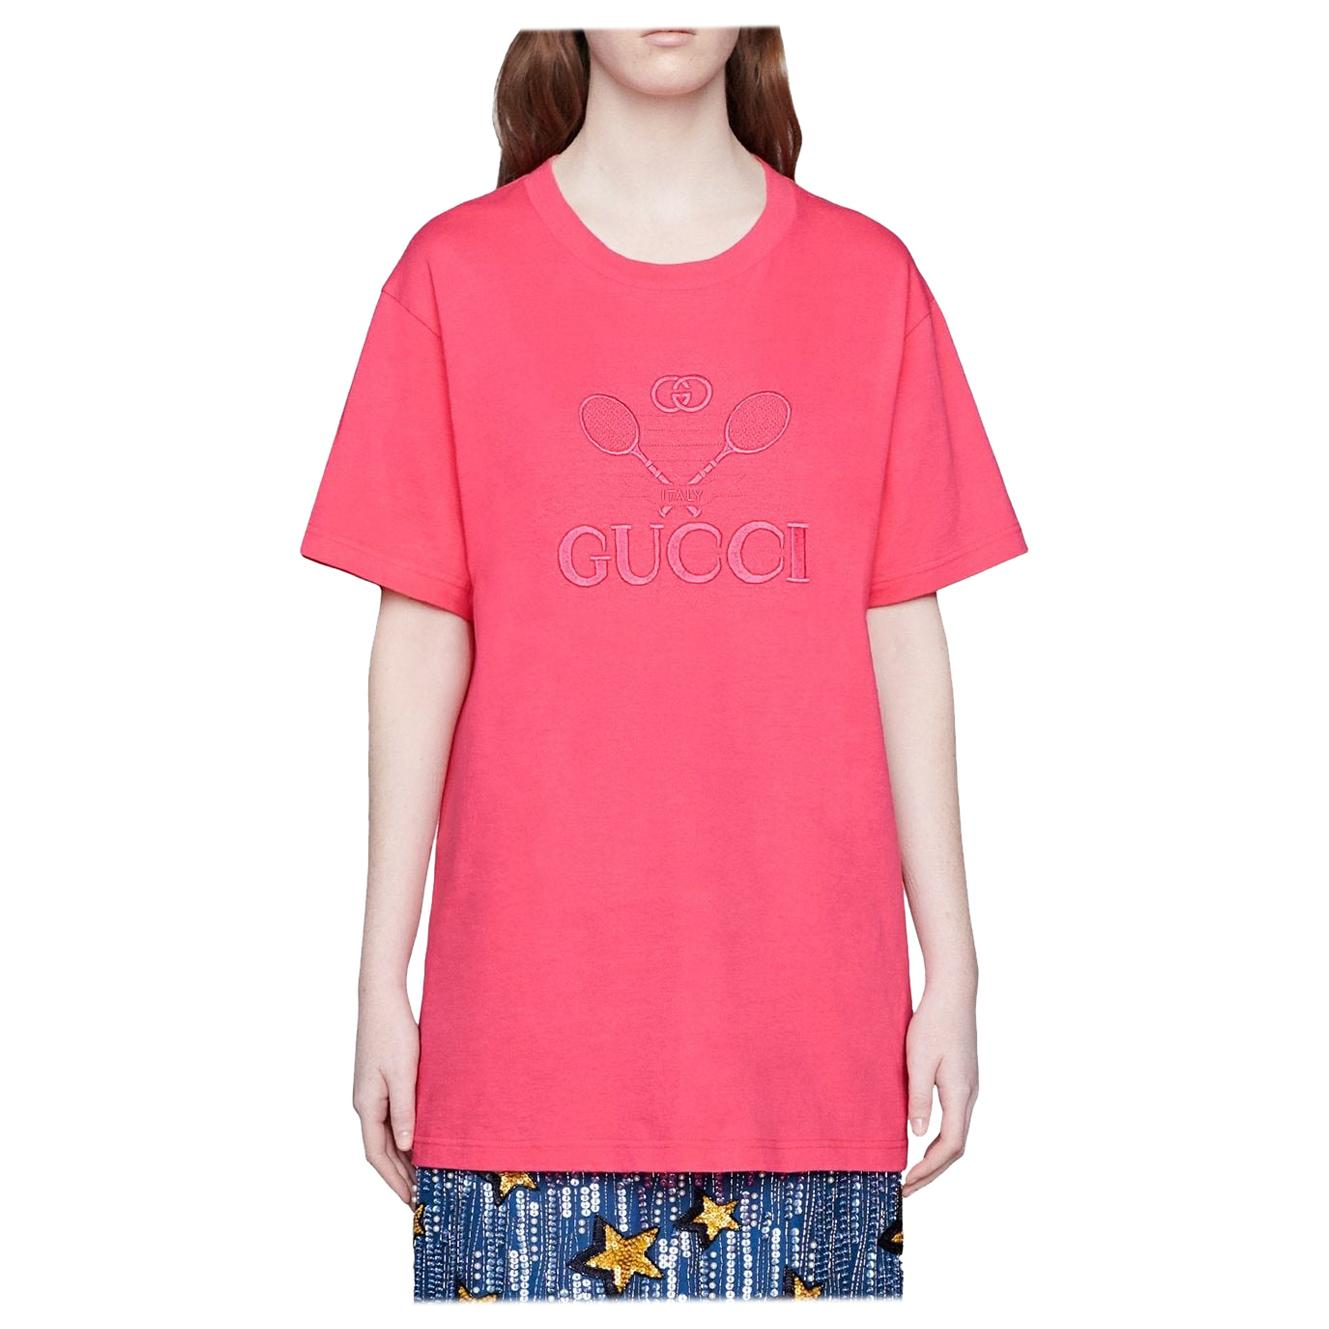 Gucci GG Tennis Pink Cotton Logo T-Shirt - Small (580968)